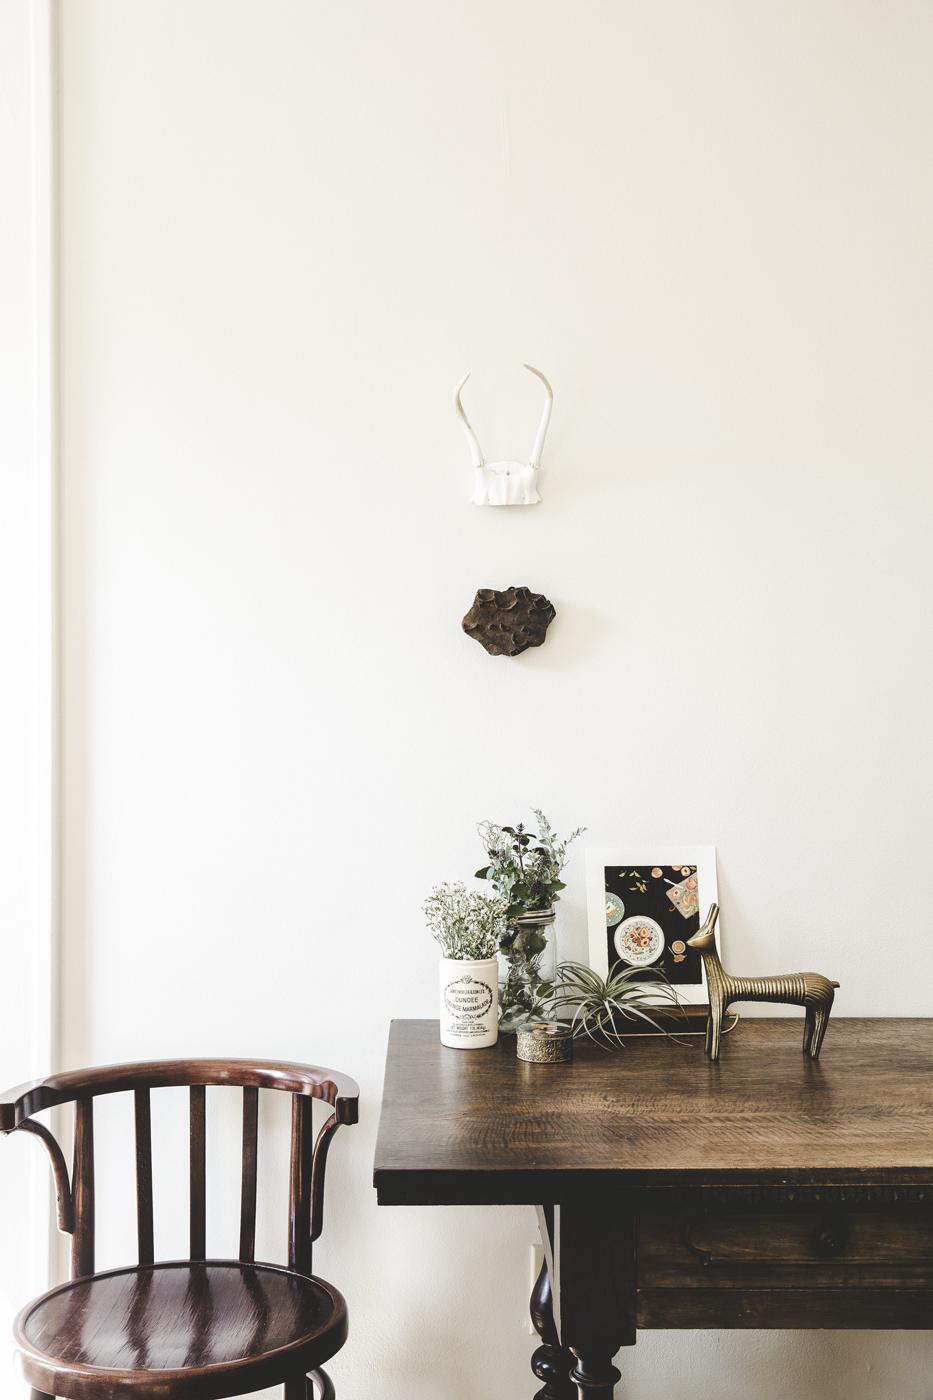 50-The-Spin-Style_Darcie-Adler_Giana-Shorthouse_Talaia-Whisenant.jpg